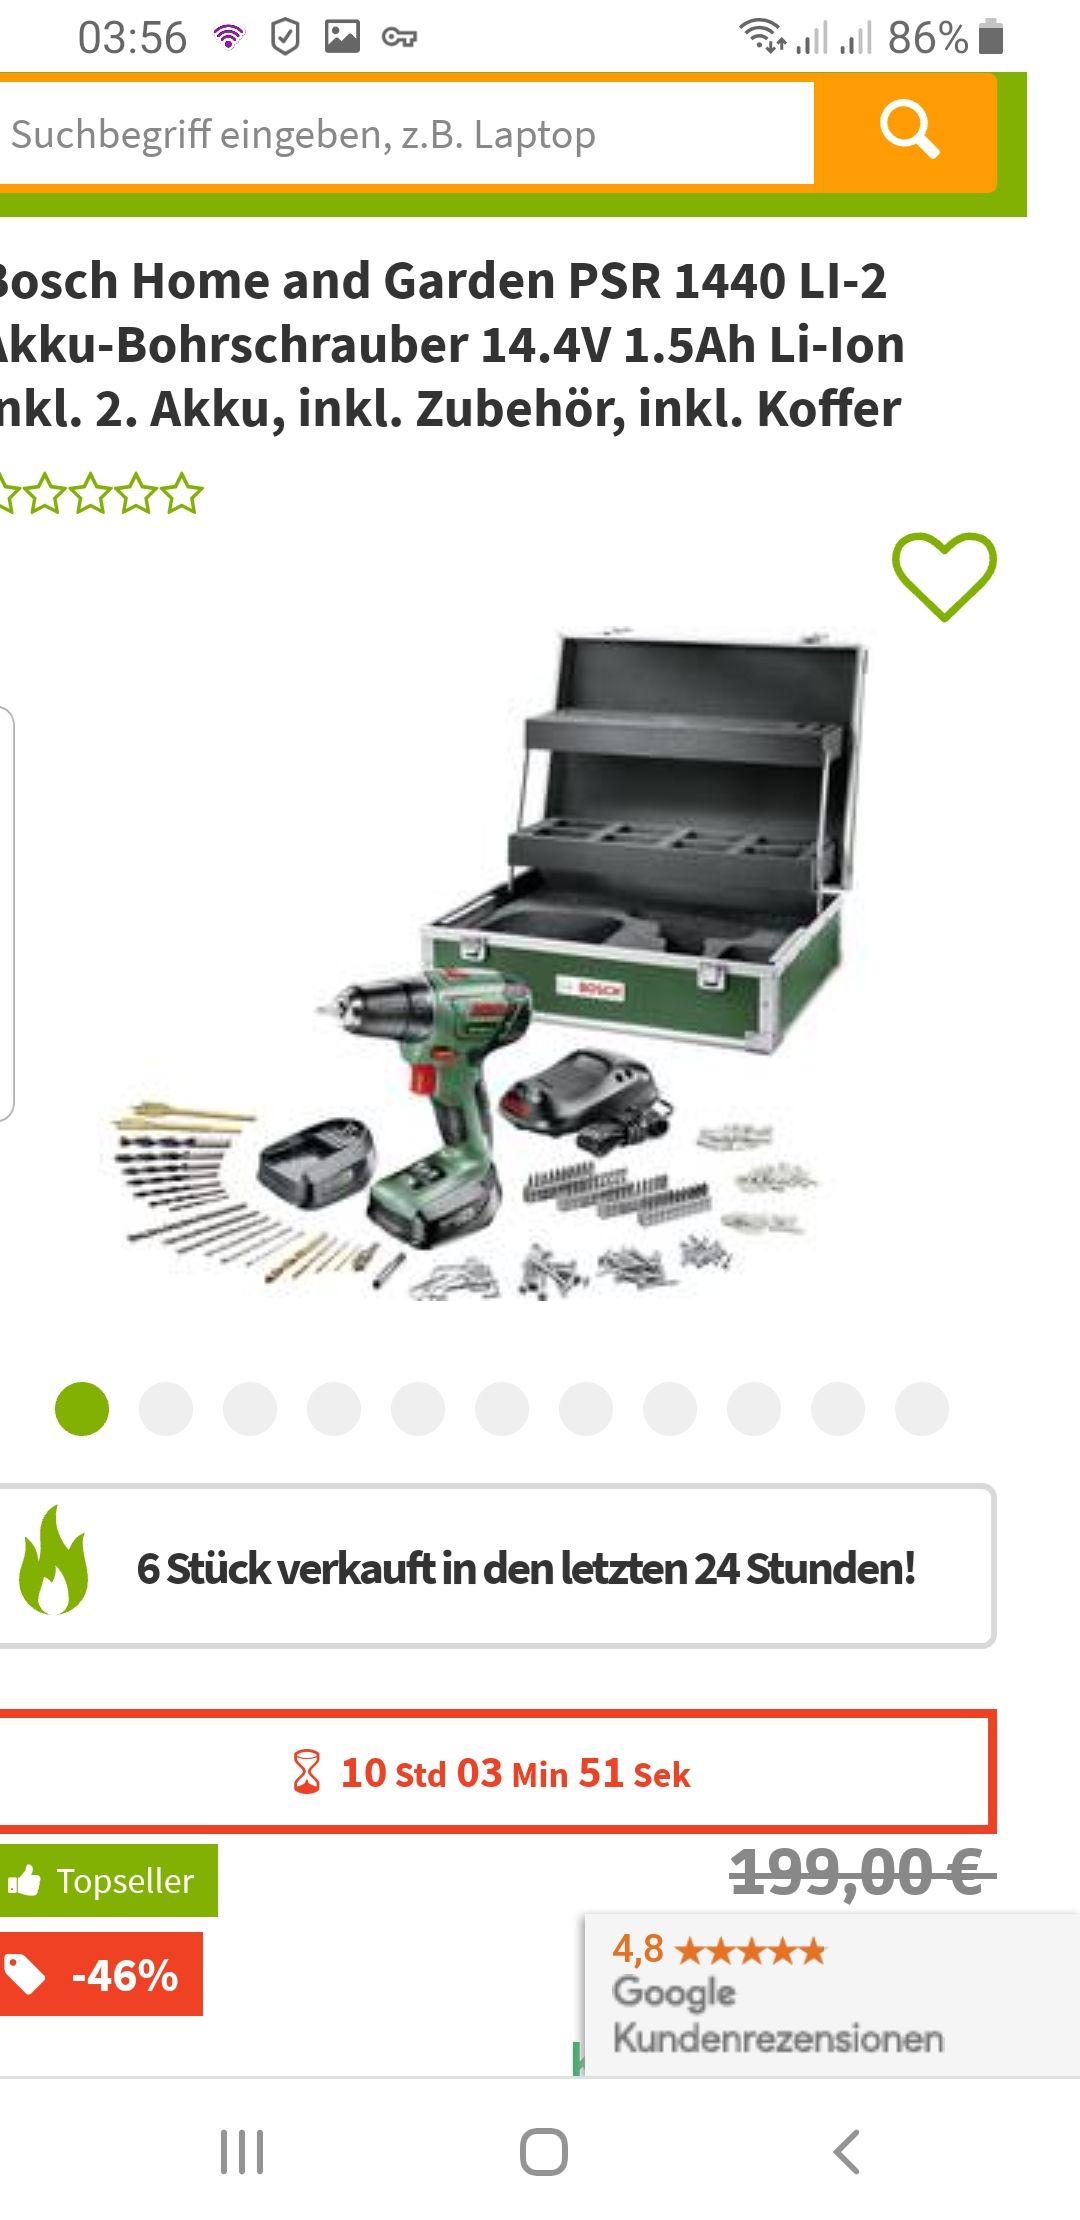 Bosch Akku Schrauber PSR 1440 LI-2 Akku-Bohrschrauber 14.4V 1.5Ah Li-Ion inkl. 2. Akku, inkl. Zubehör, inkl. Koffer  für  nur 107.99€